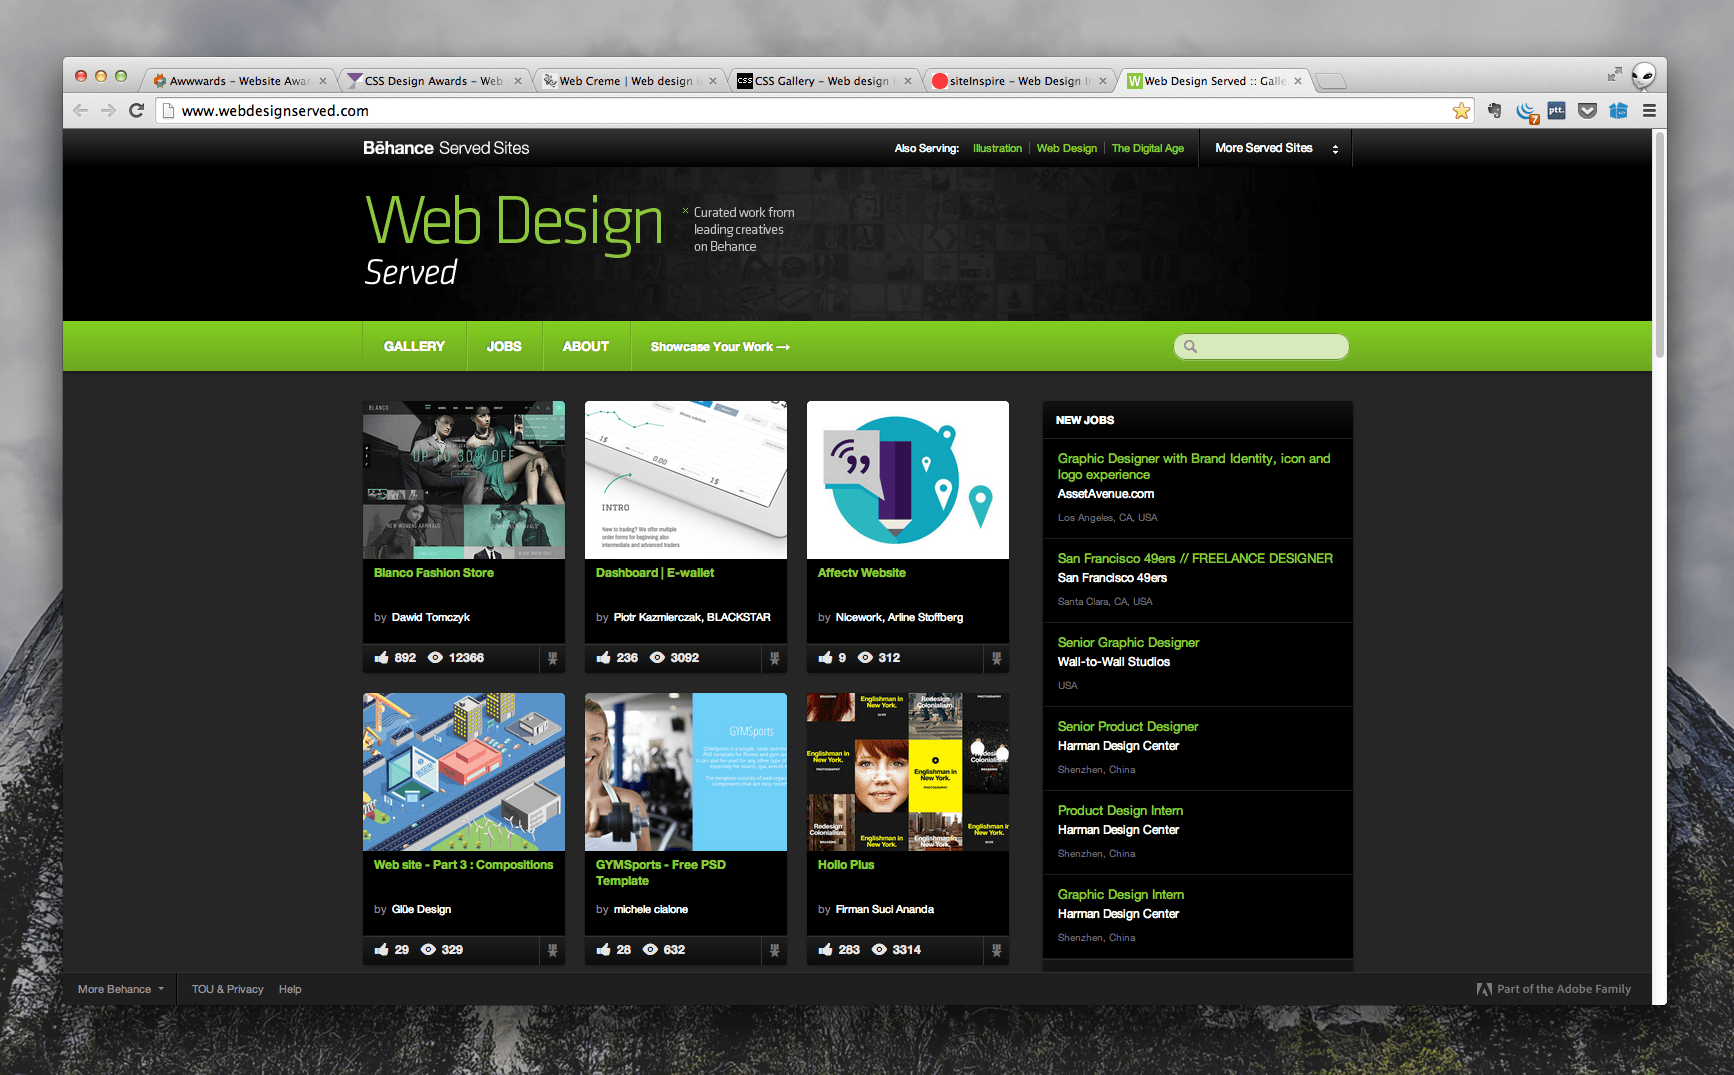 WebDesignServed